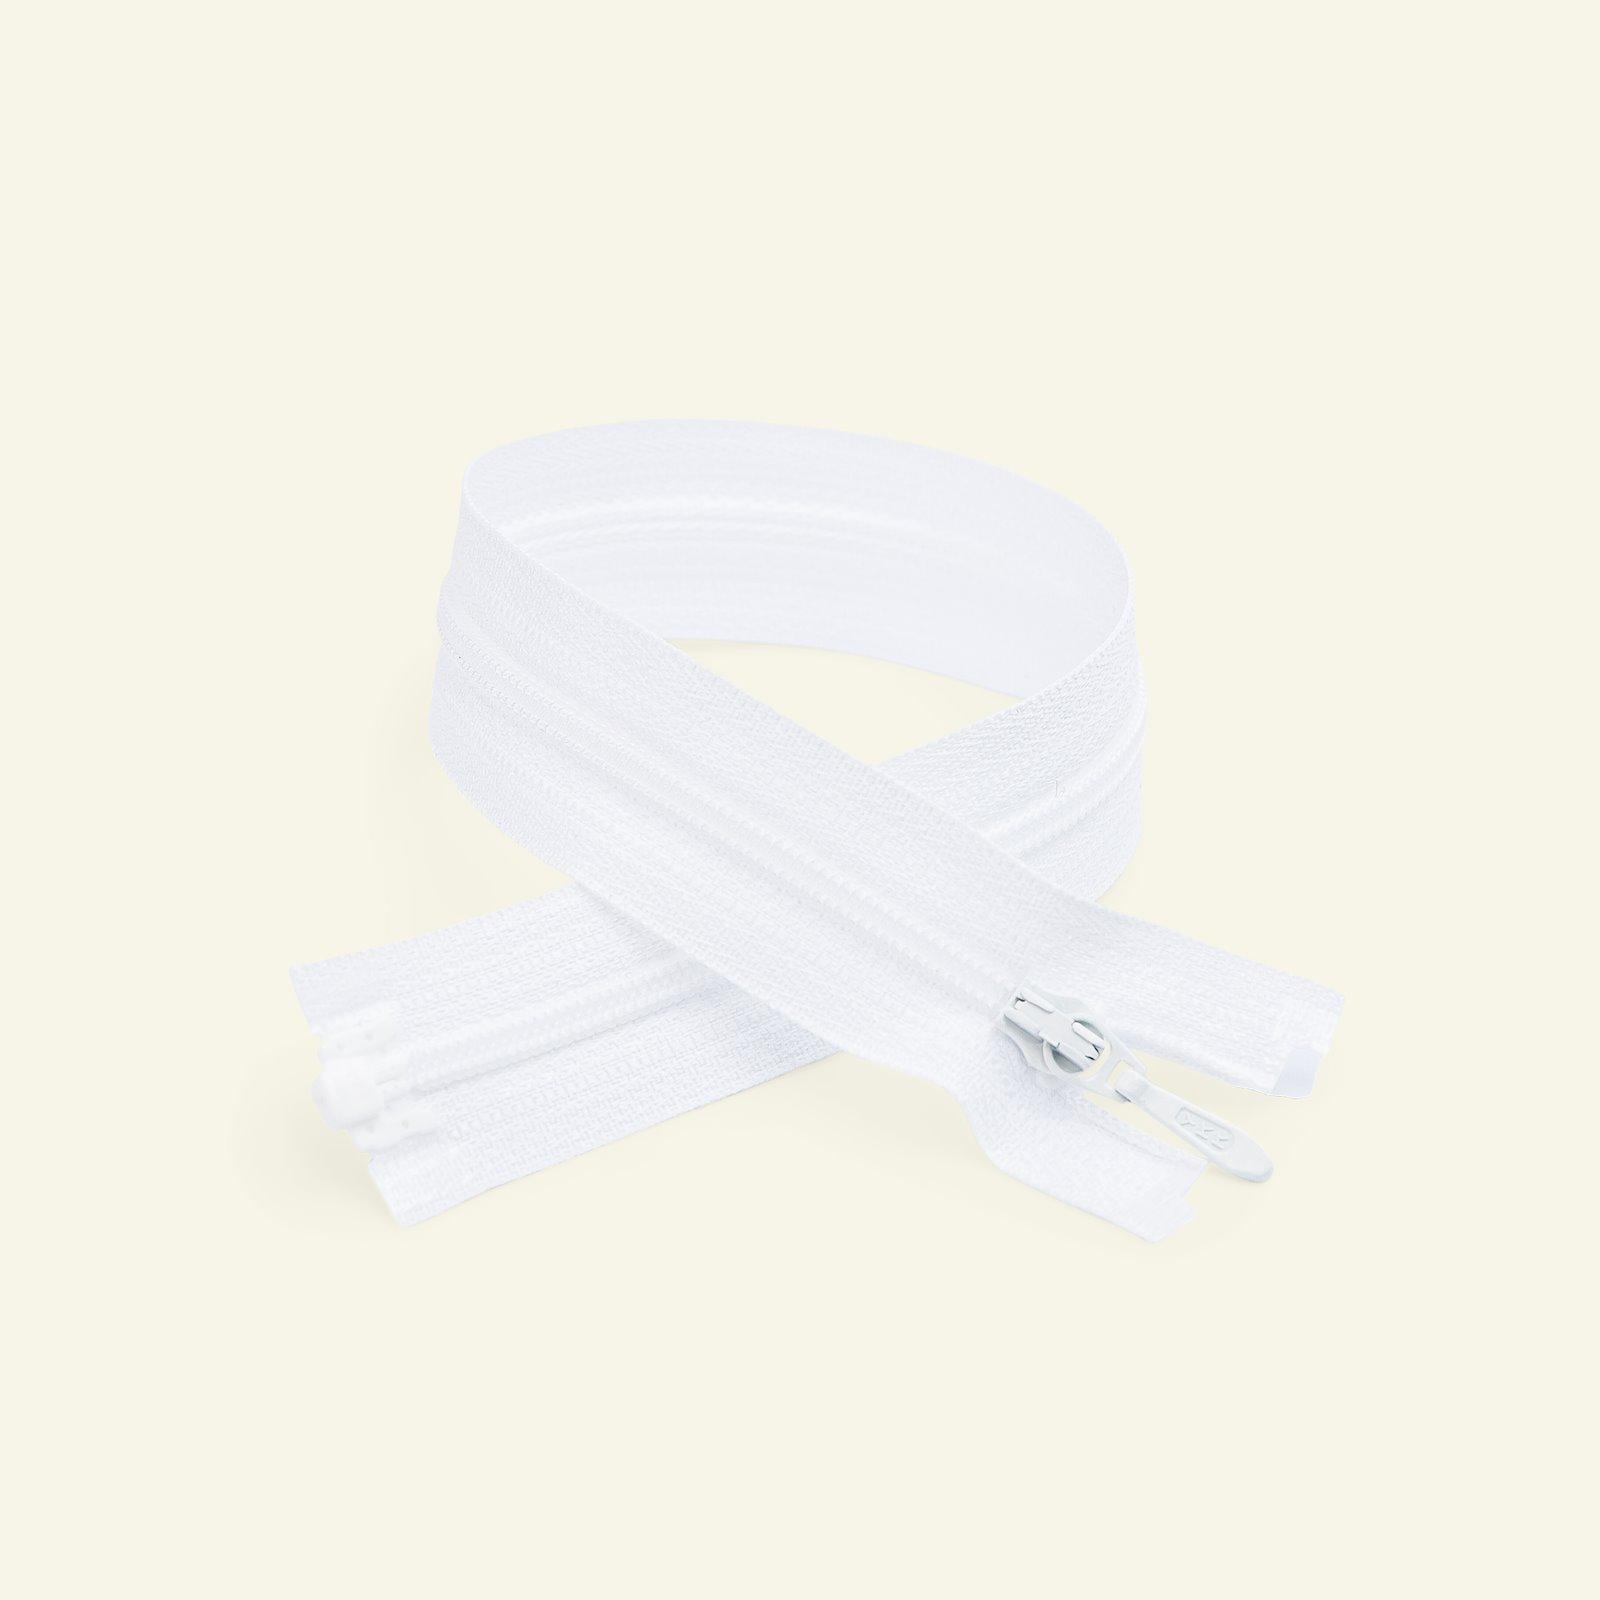 YKK zip 4mm open end 20cm white x40601_pack